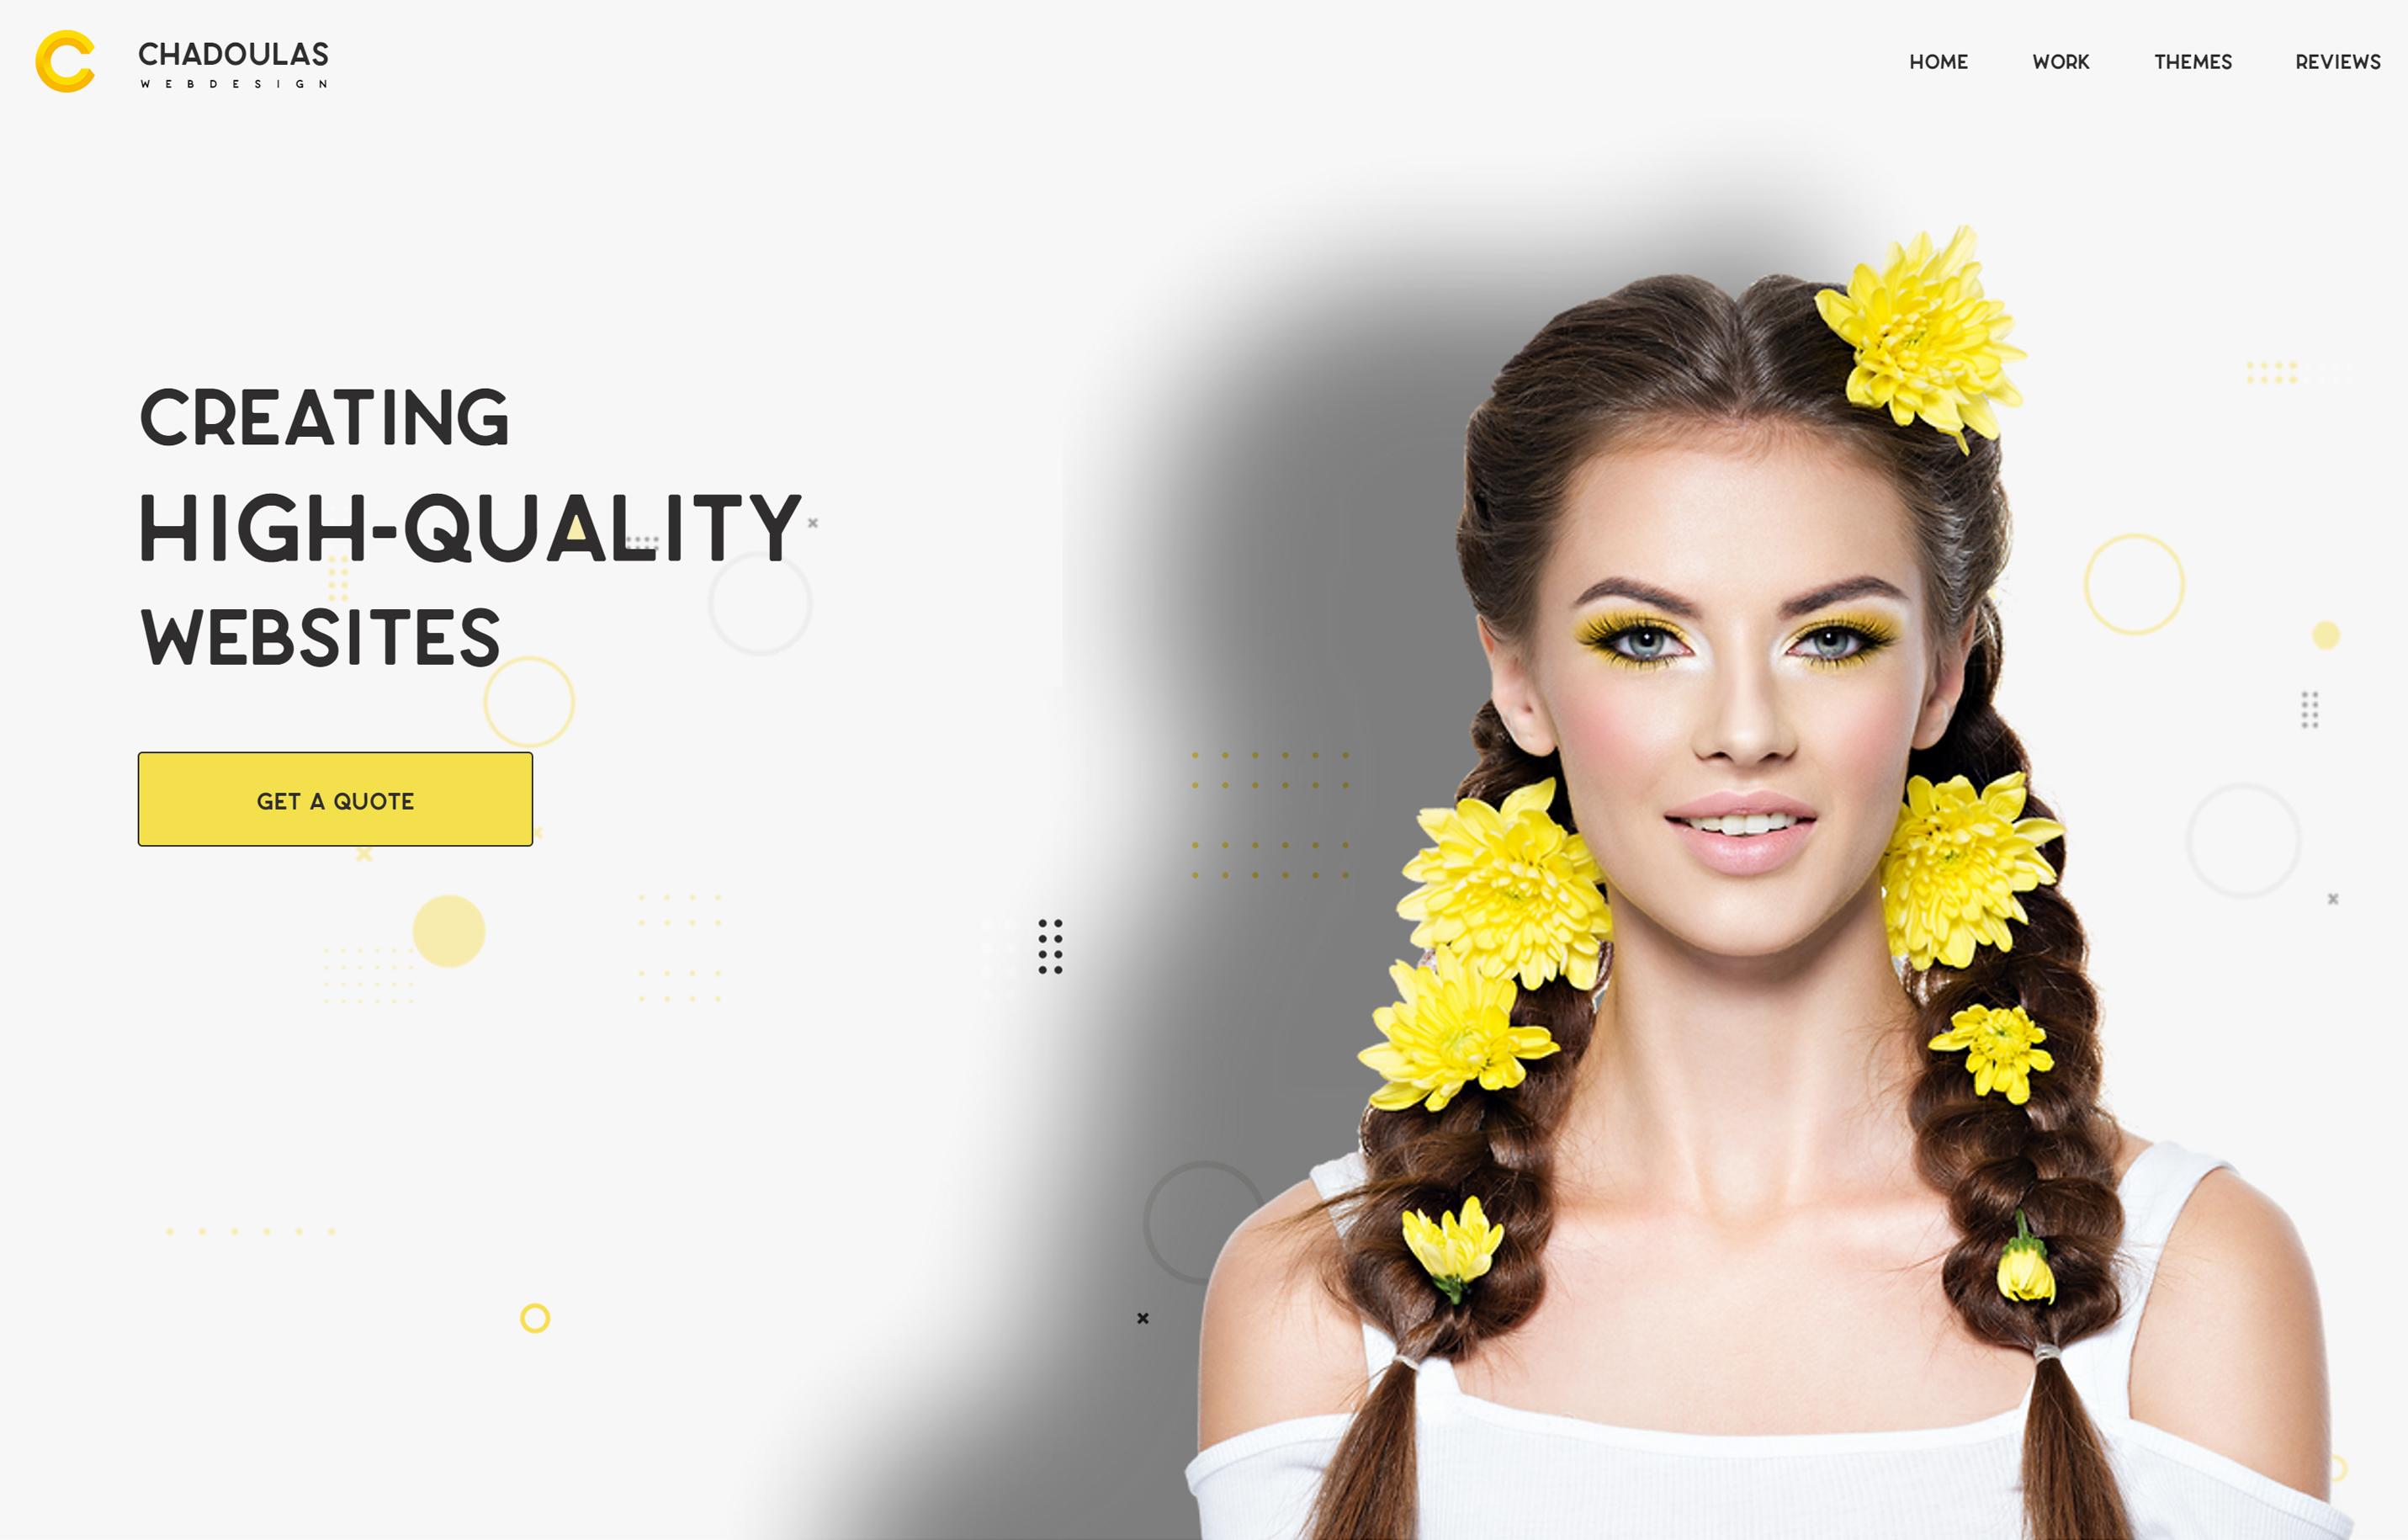 chadoulas Chadoulas Web Design: Creating High-Quality Websit...